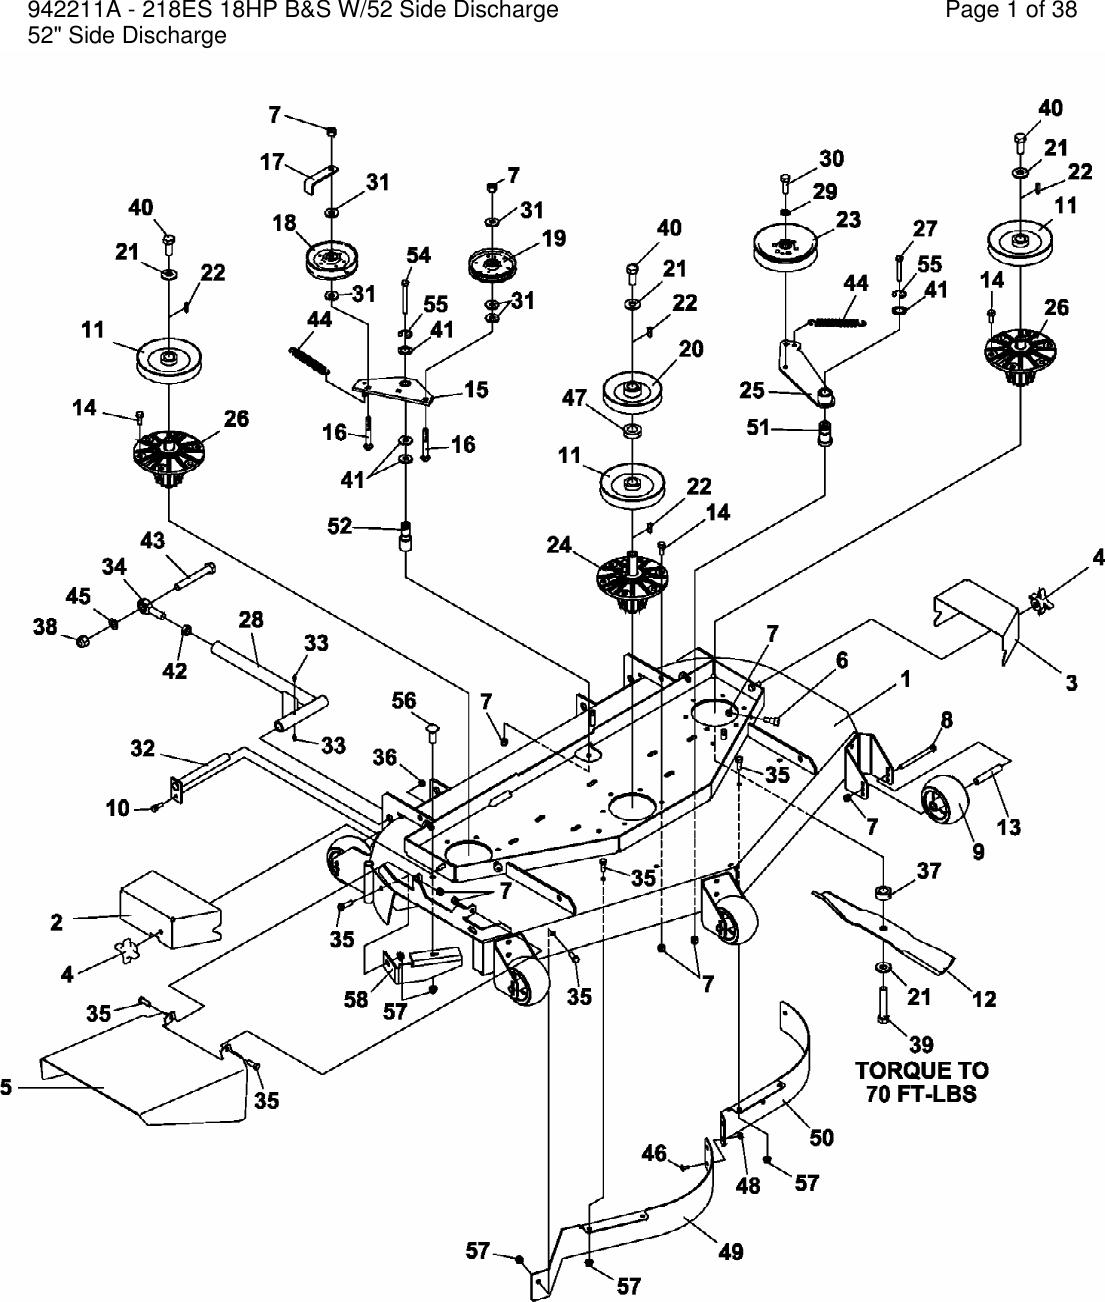 hight resolution of  bobcat bobcat wiring schematic zt200 schematics diagram on bobcat hvac schematic bobcat controls